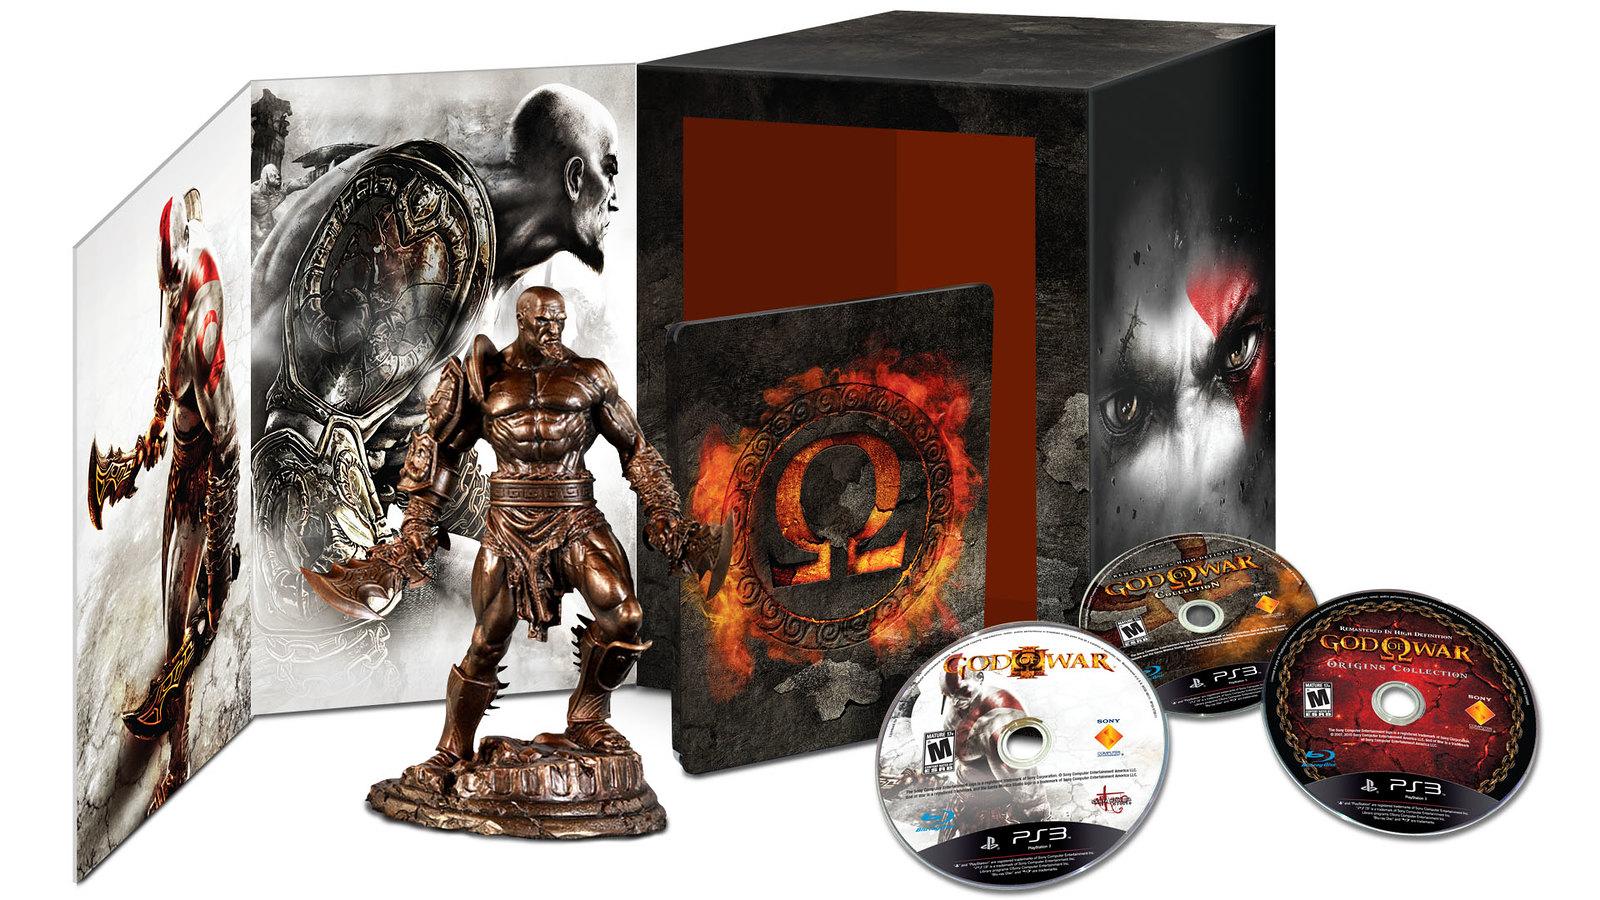 [Tópico Oficial] GOD OF WAR: Ascension - Confira o Box de GoW: Omega Collection! - Página 2 7158300617_2342da345f_h